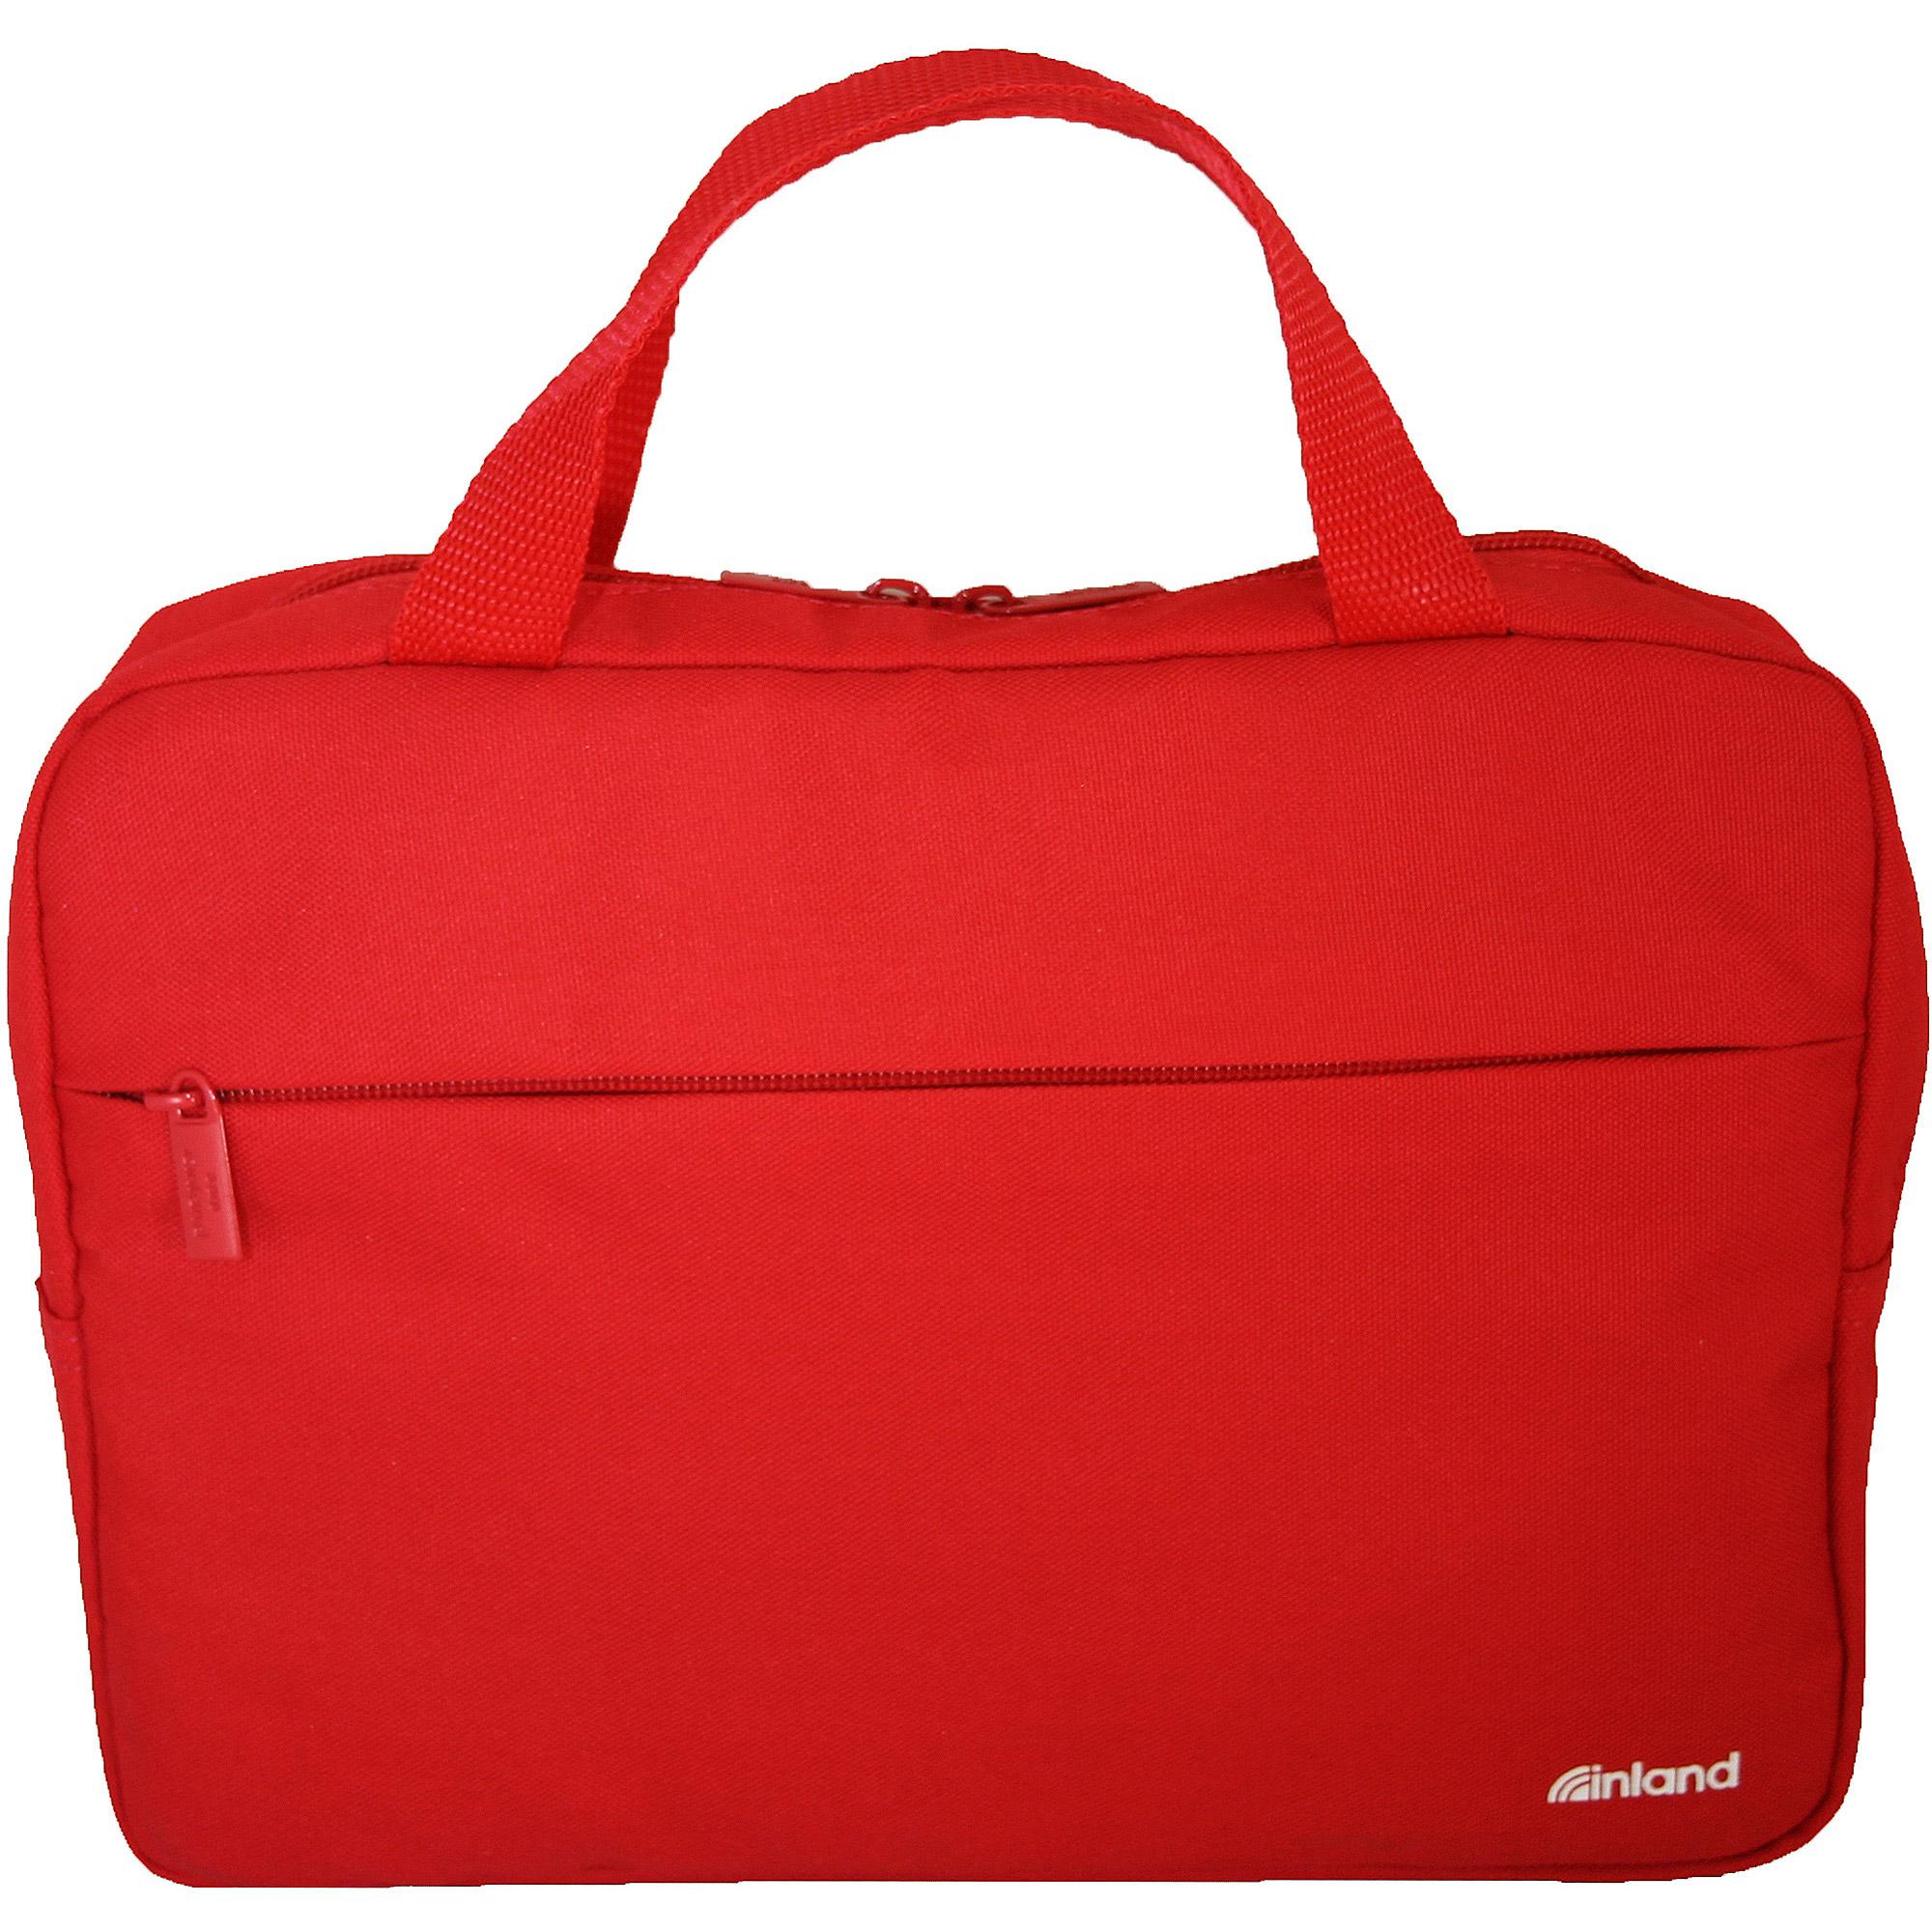 "Inland Pro 15.6"" Notebook Laptop Bag"